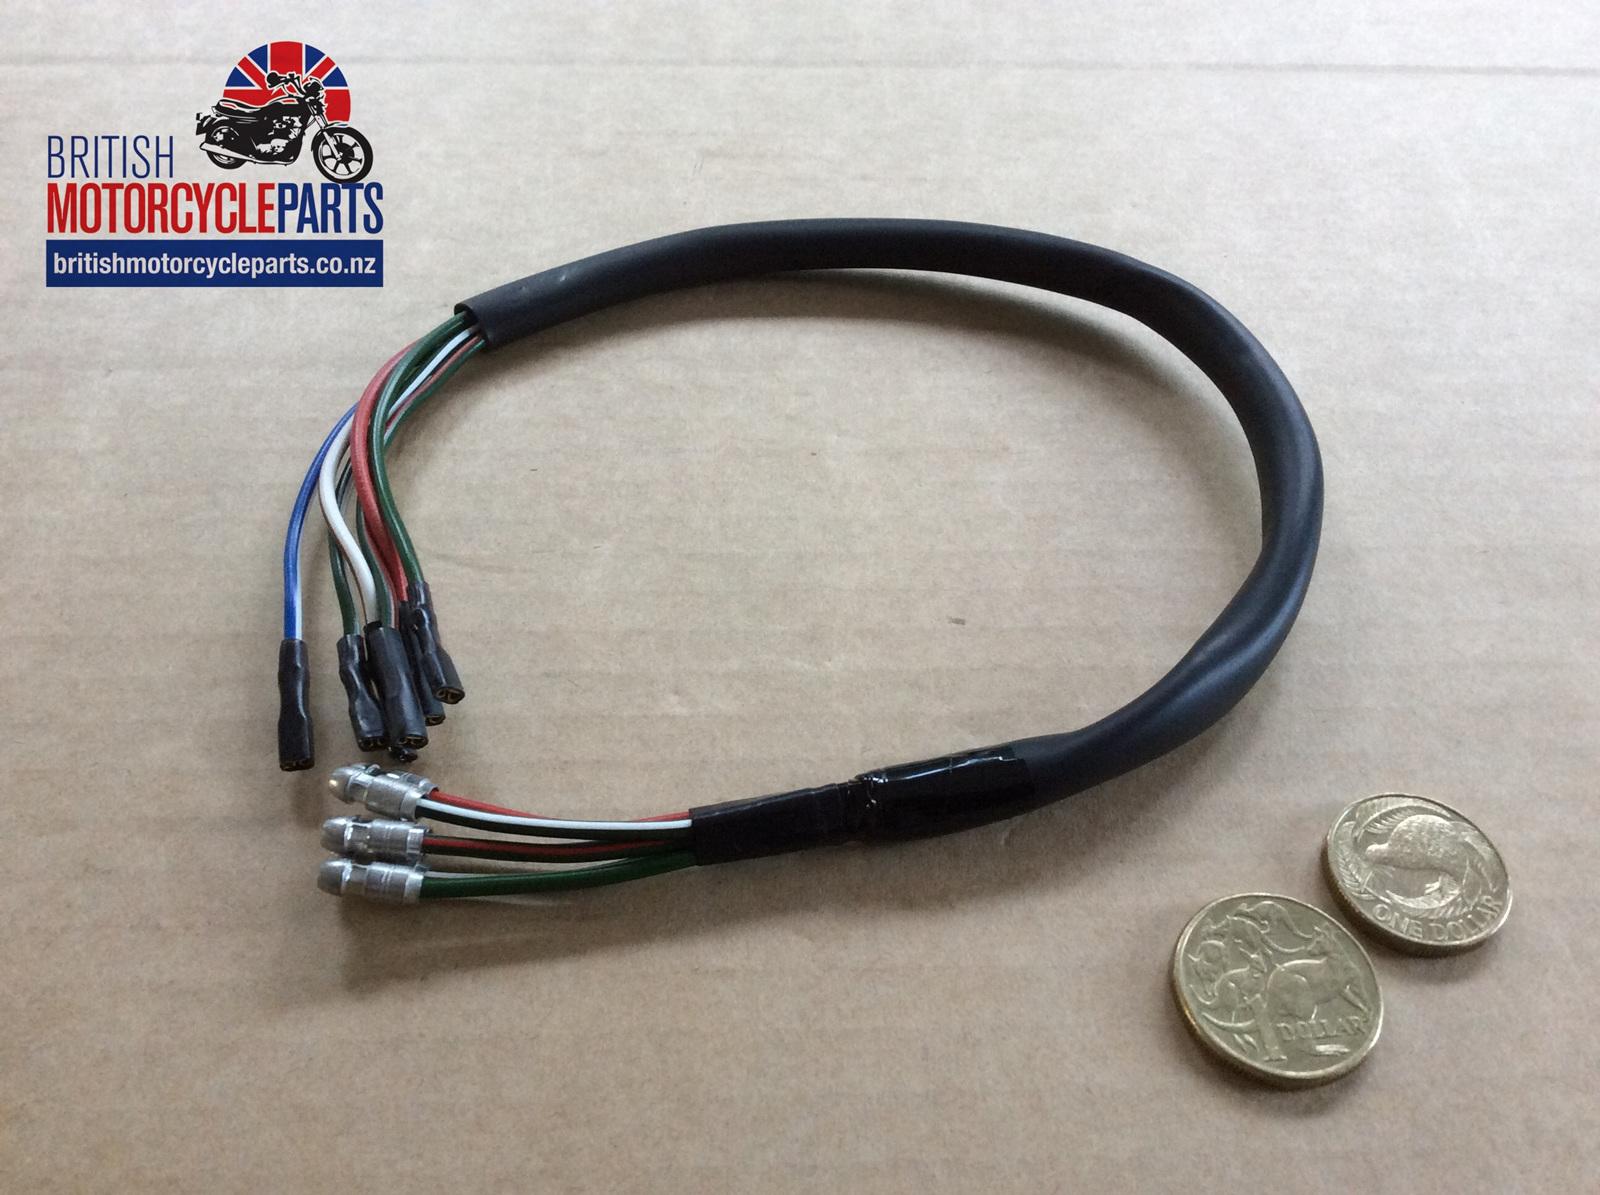 06 5902 Consol Wiring Loom Mk3 Commando 1975 British Motorcycle Looms